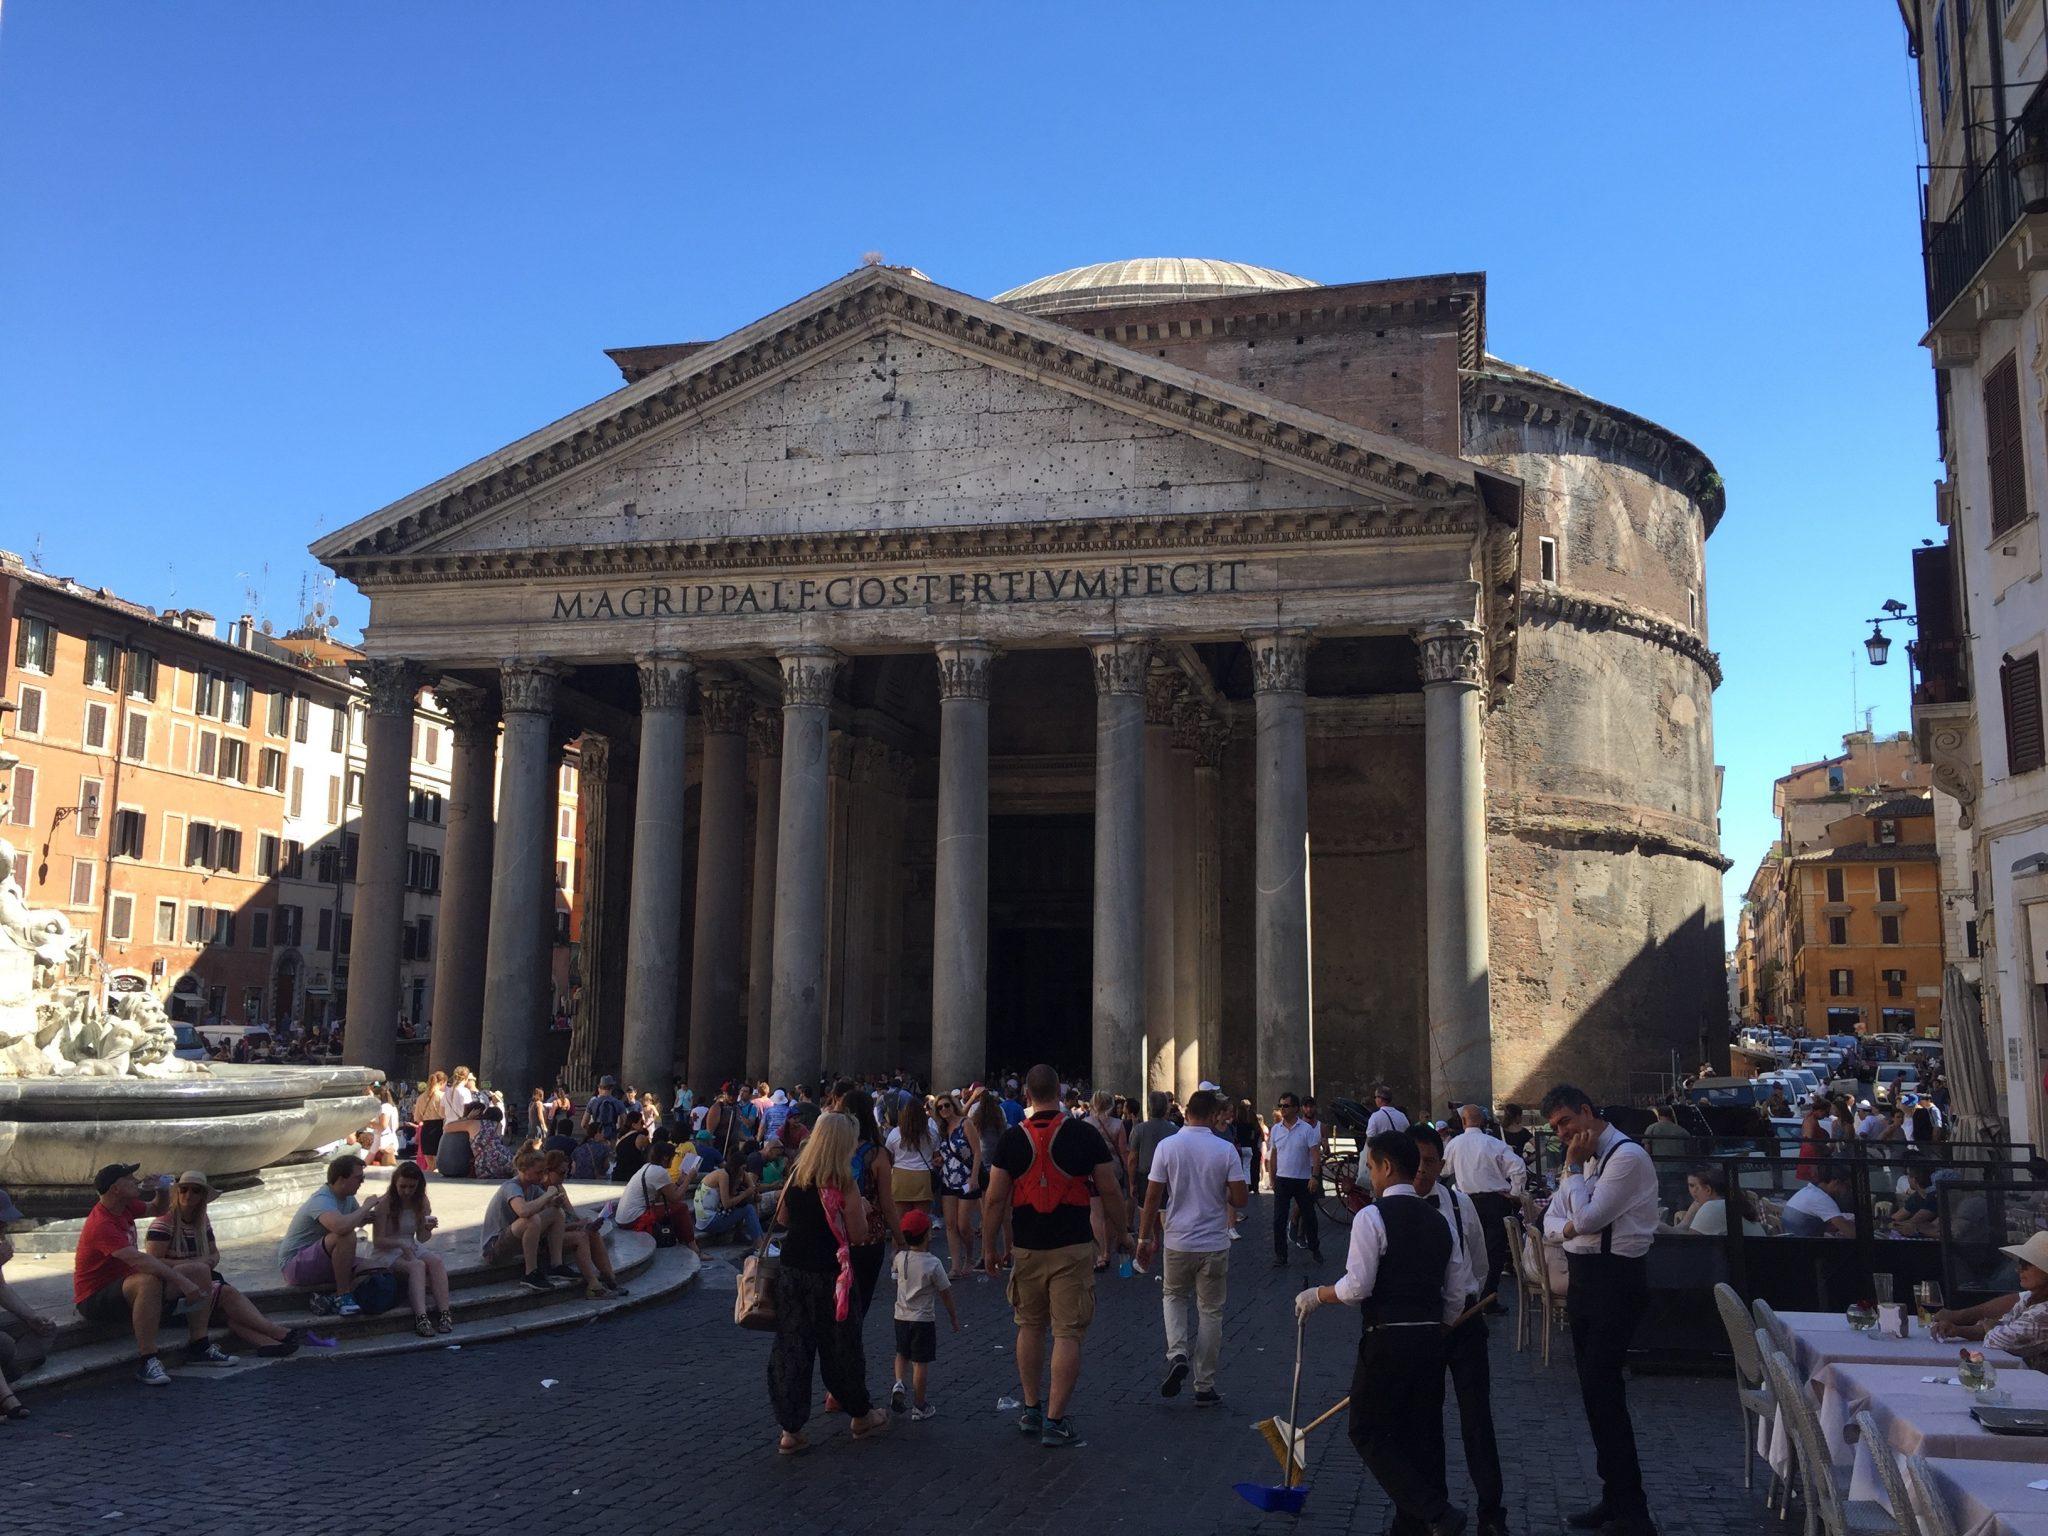 Fakta om Pantheon